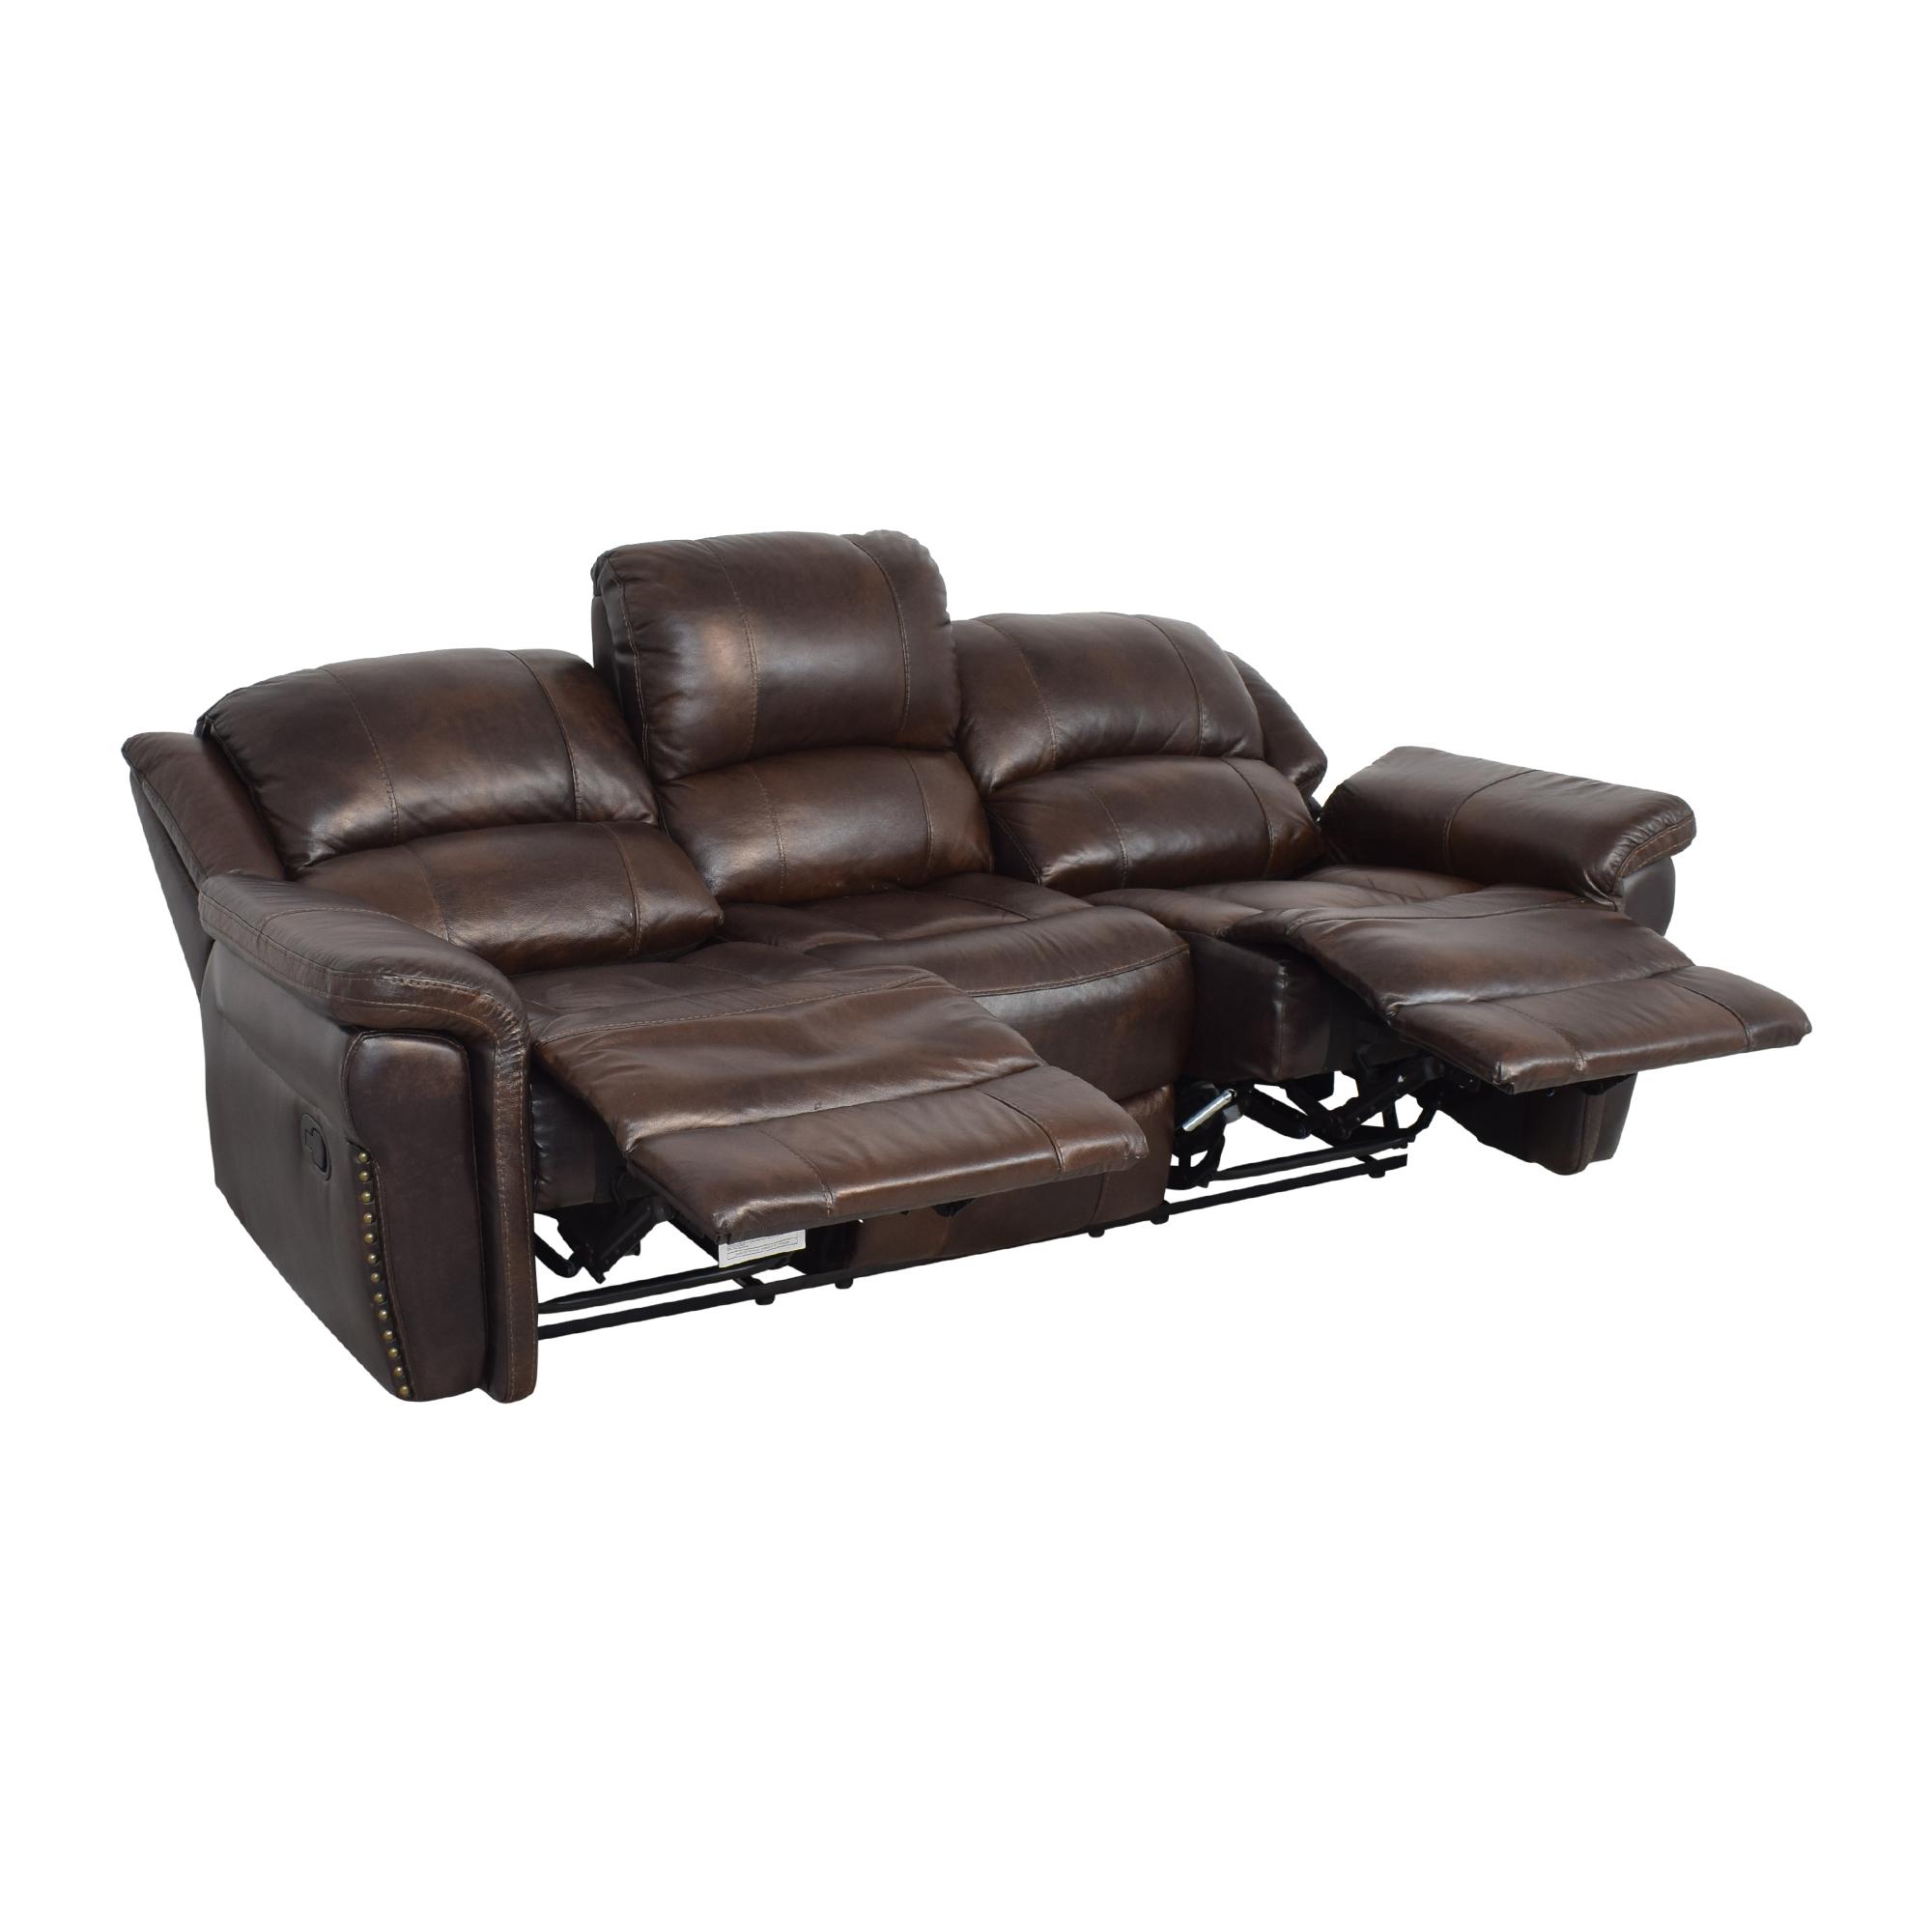 Delancey Street Furniture Recliner Sofa / Classic Sofas